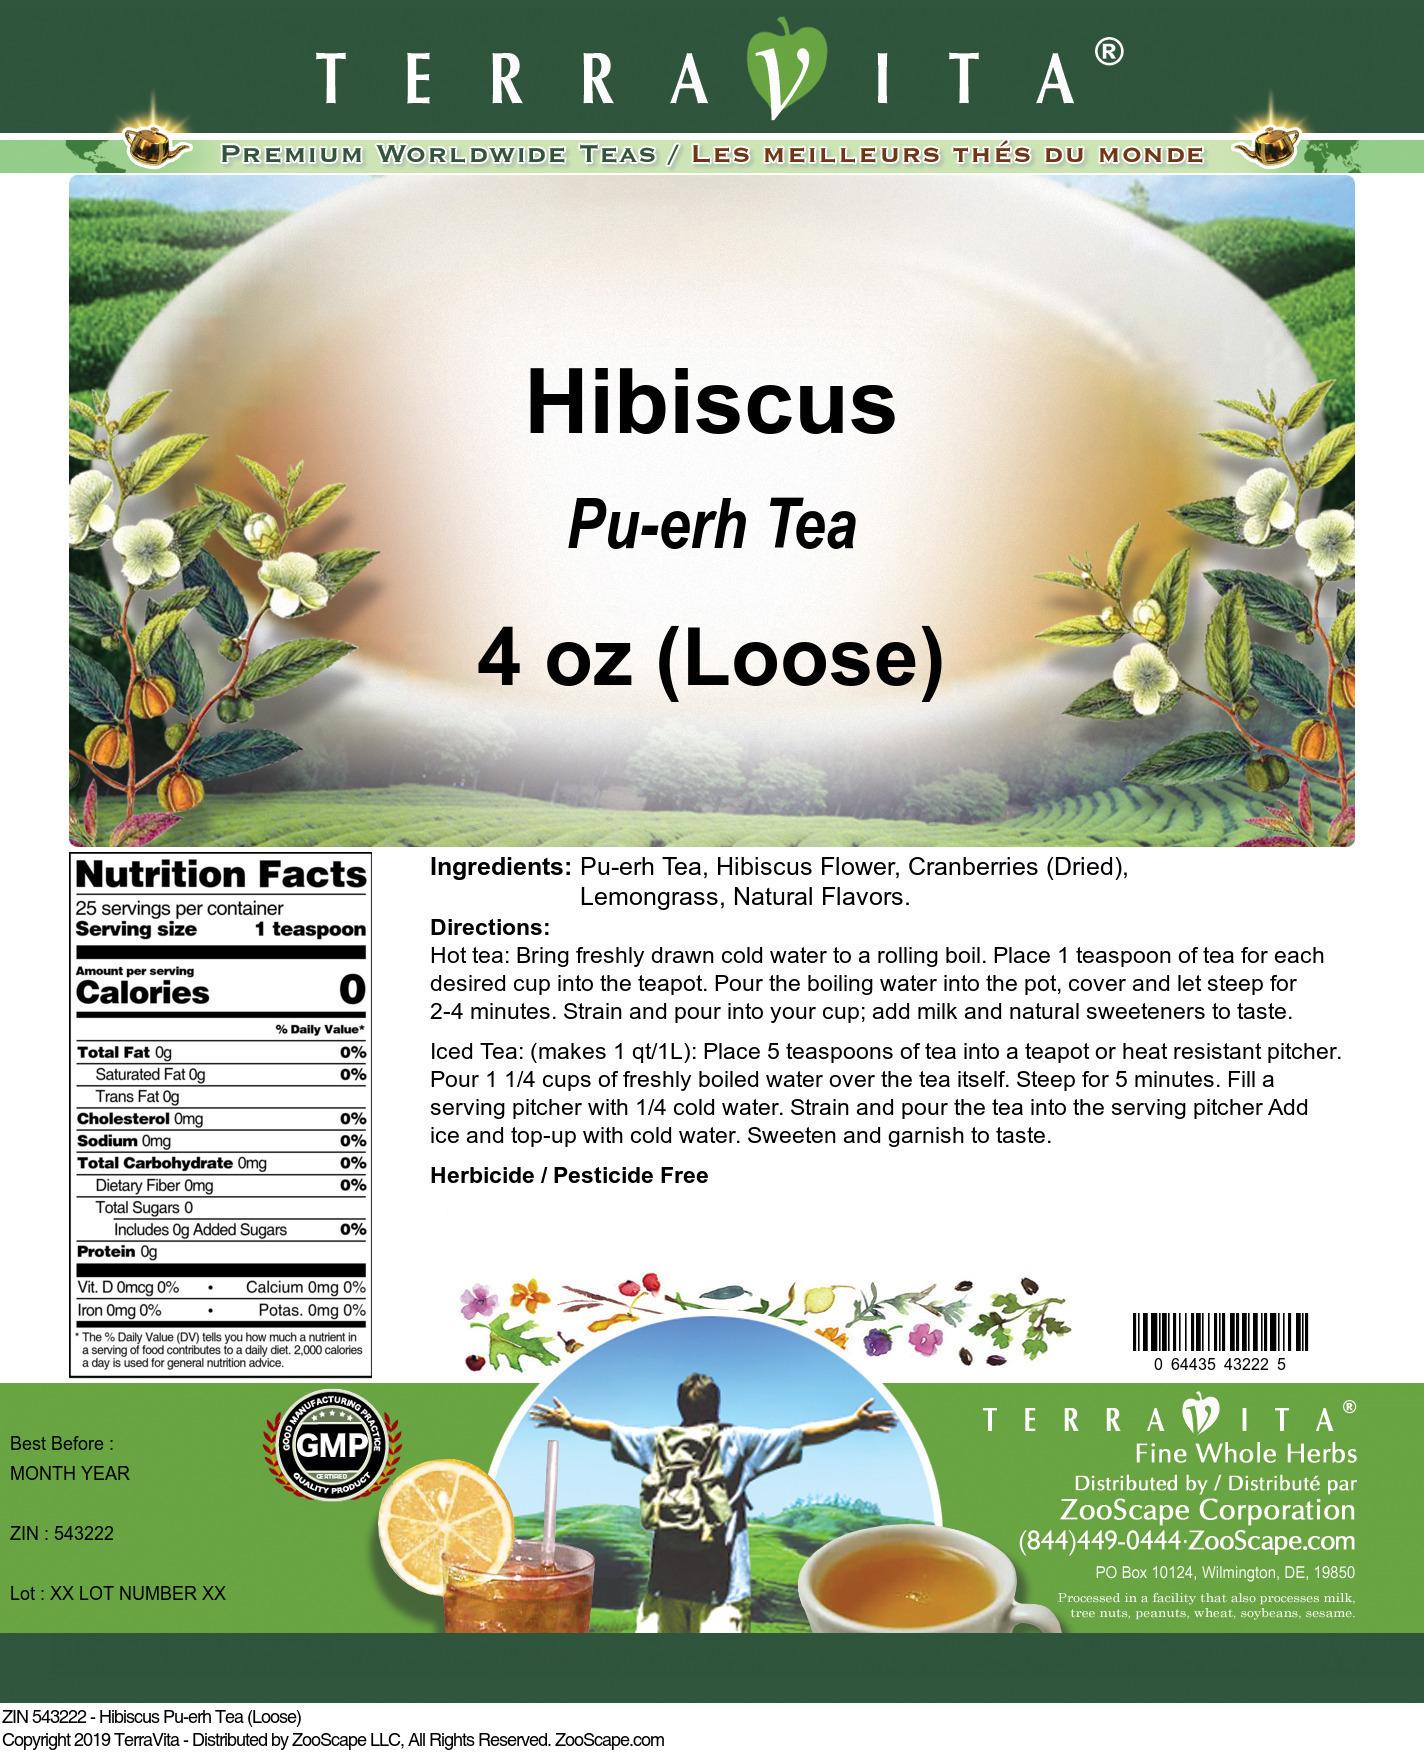 Hibiscus Pu-erh Tea